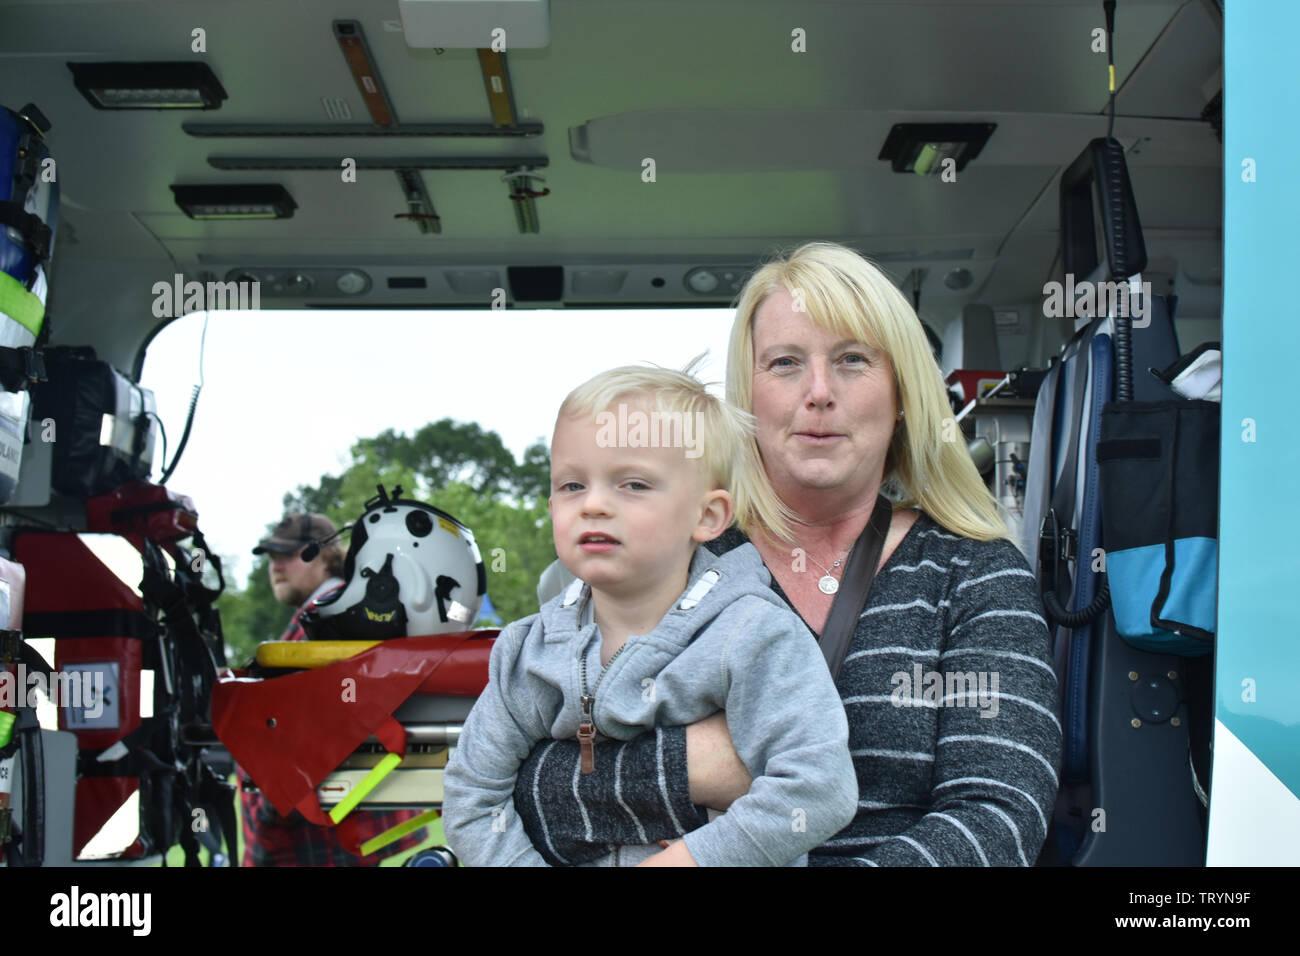 Leonardo AW169: G-KSST of Kent, Surrey & Sussex, Air Ambulance showing off the Ambulance from Radnor Park, Folkestone U.K - Stock Image